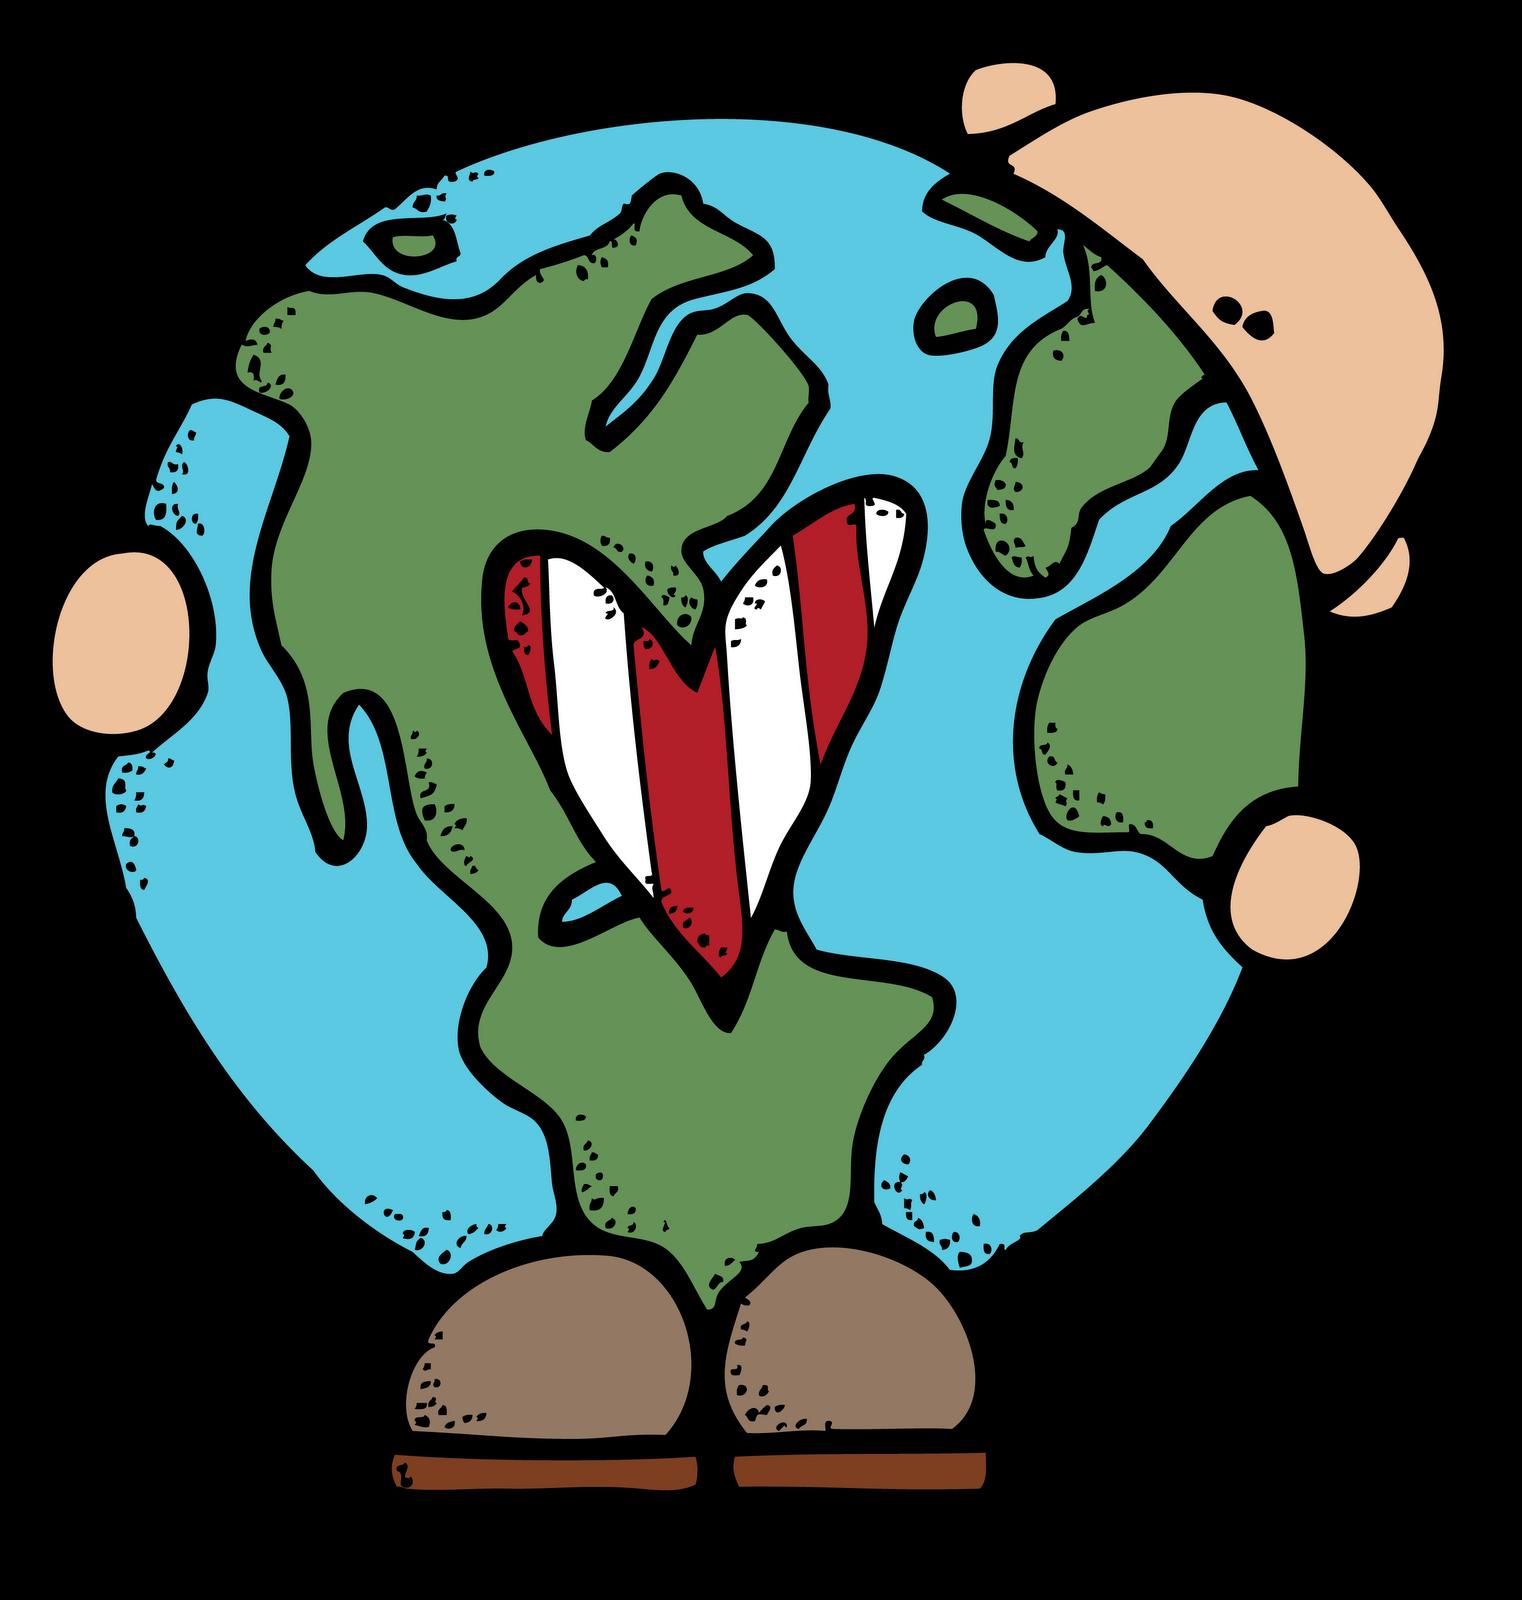 Geography clipart school. Melonheadz free printable earth